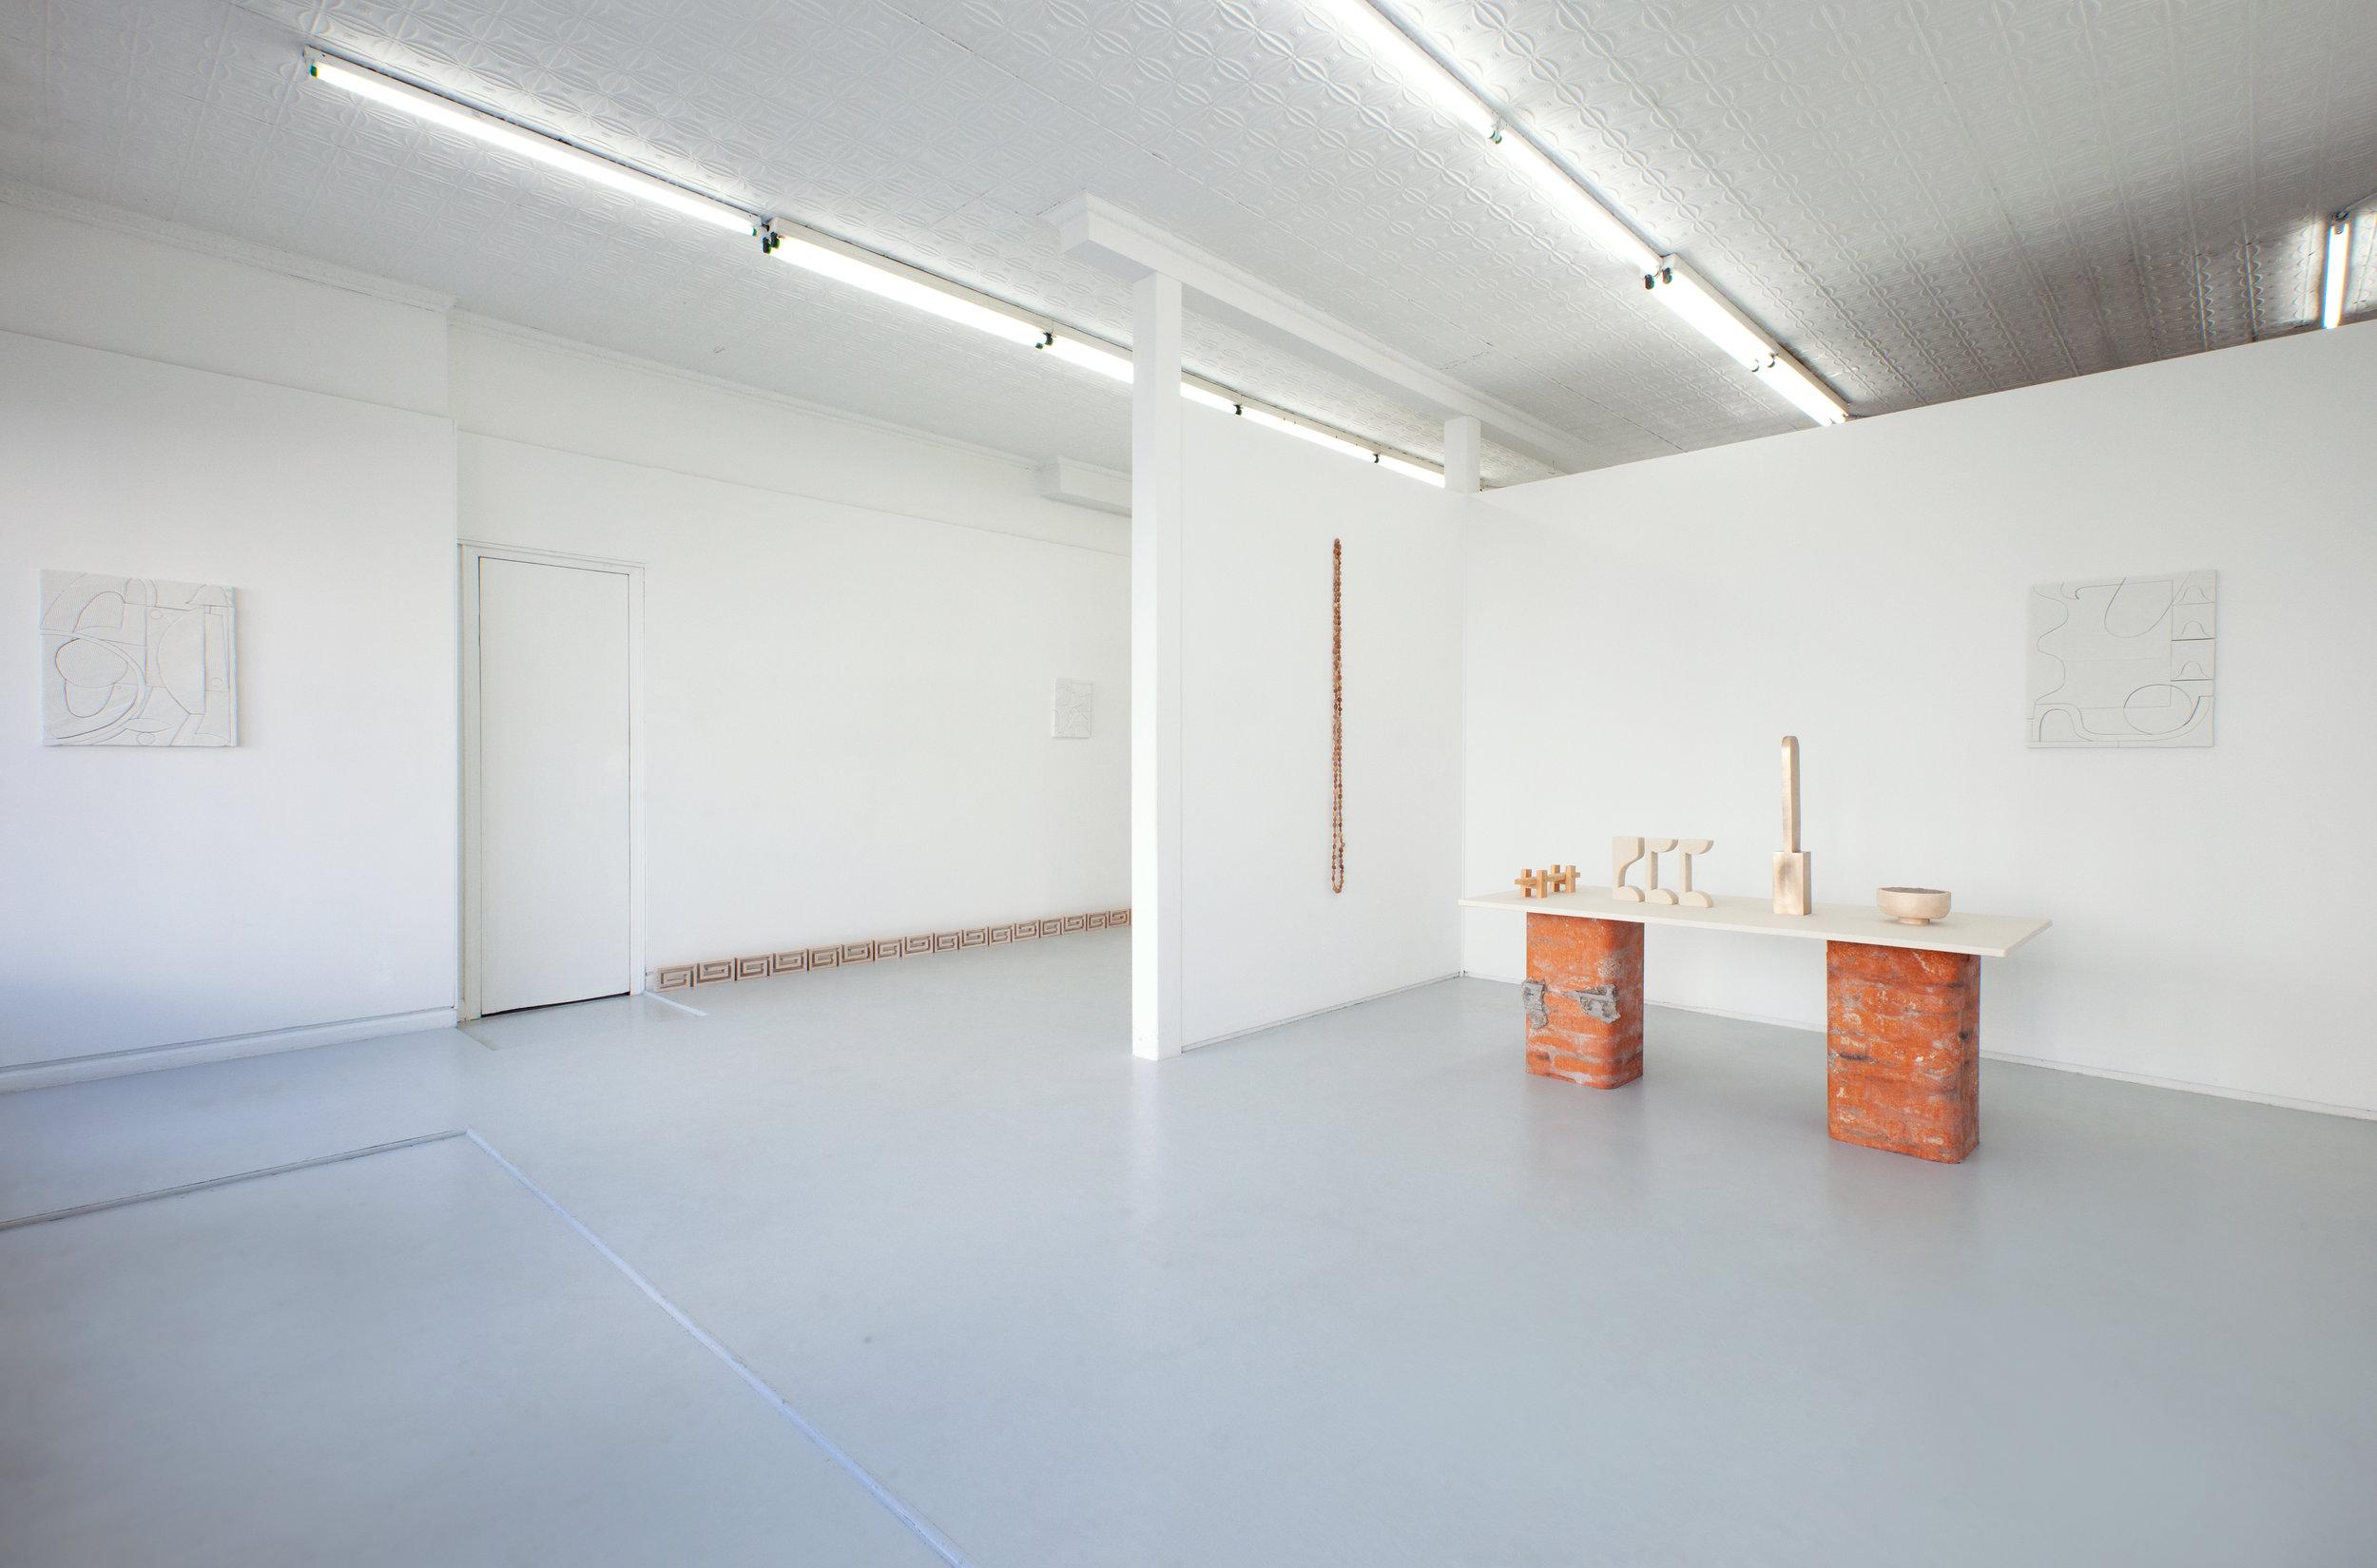 Elizabeth_Atterbury-Night_Comes_In-Installation_View_015.jpg